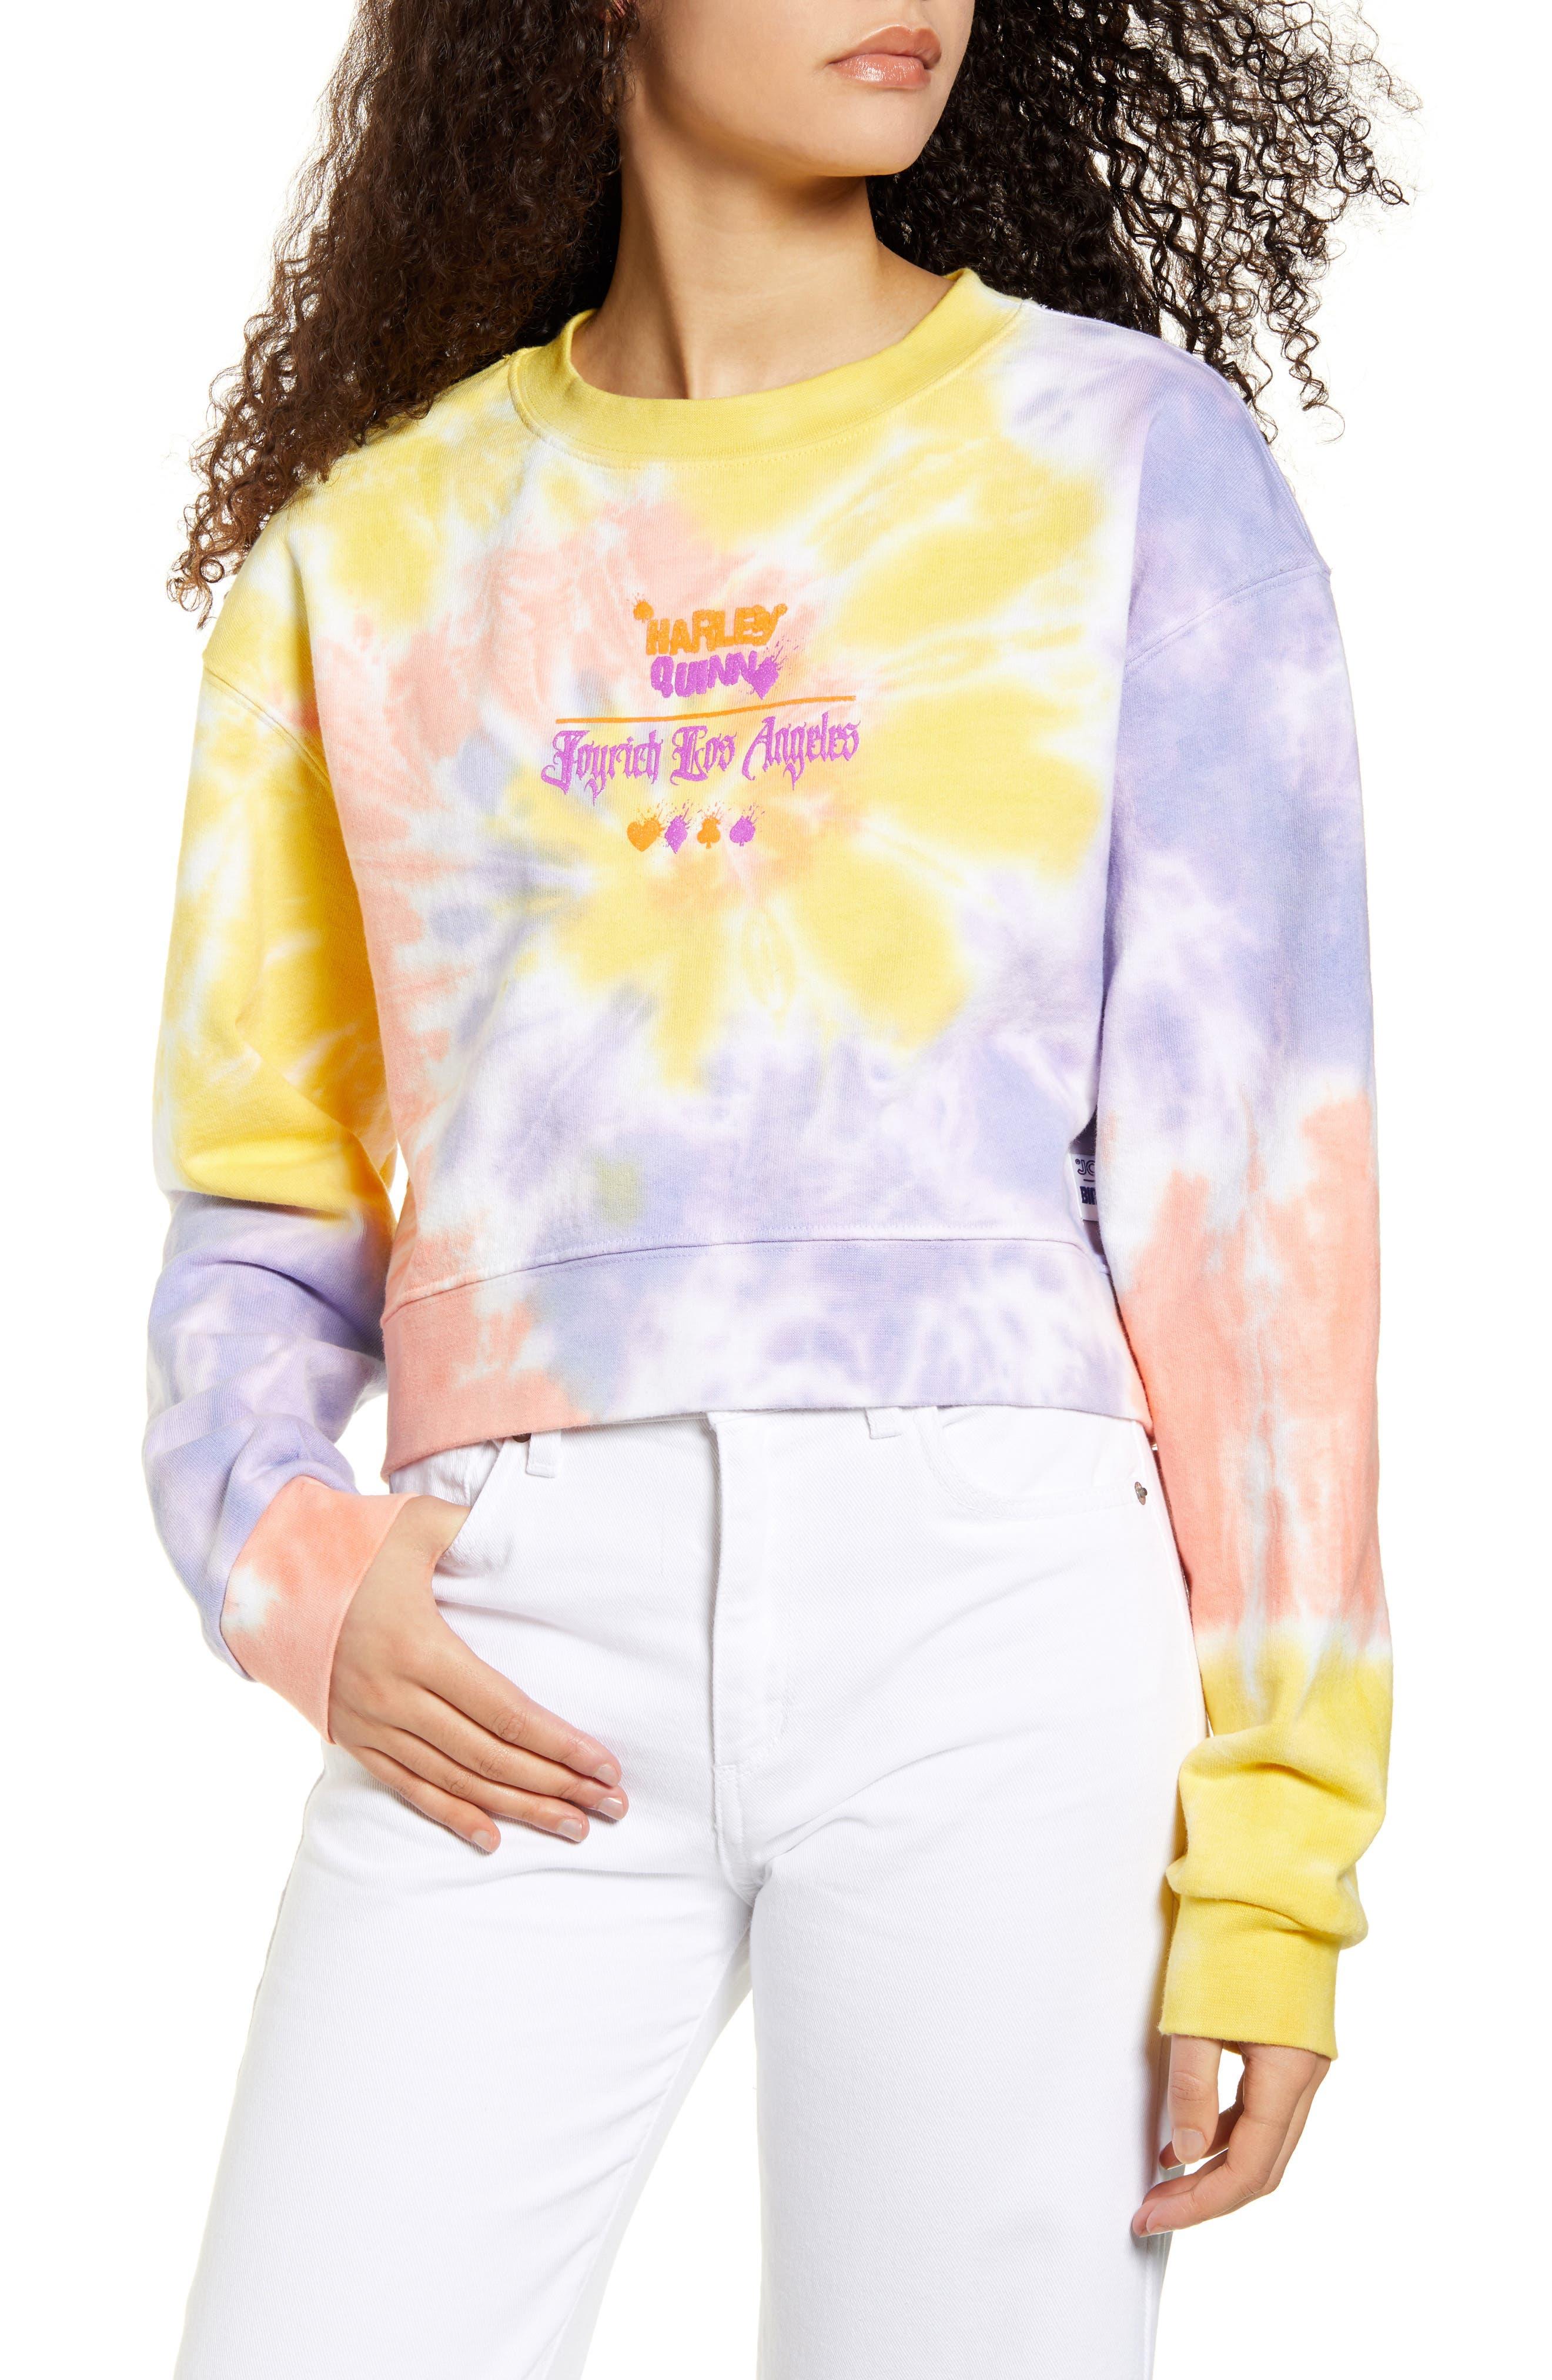 Image of BIRDS OF PREY Harley Quinn Tie Dye Cotton Sweatshirt